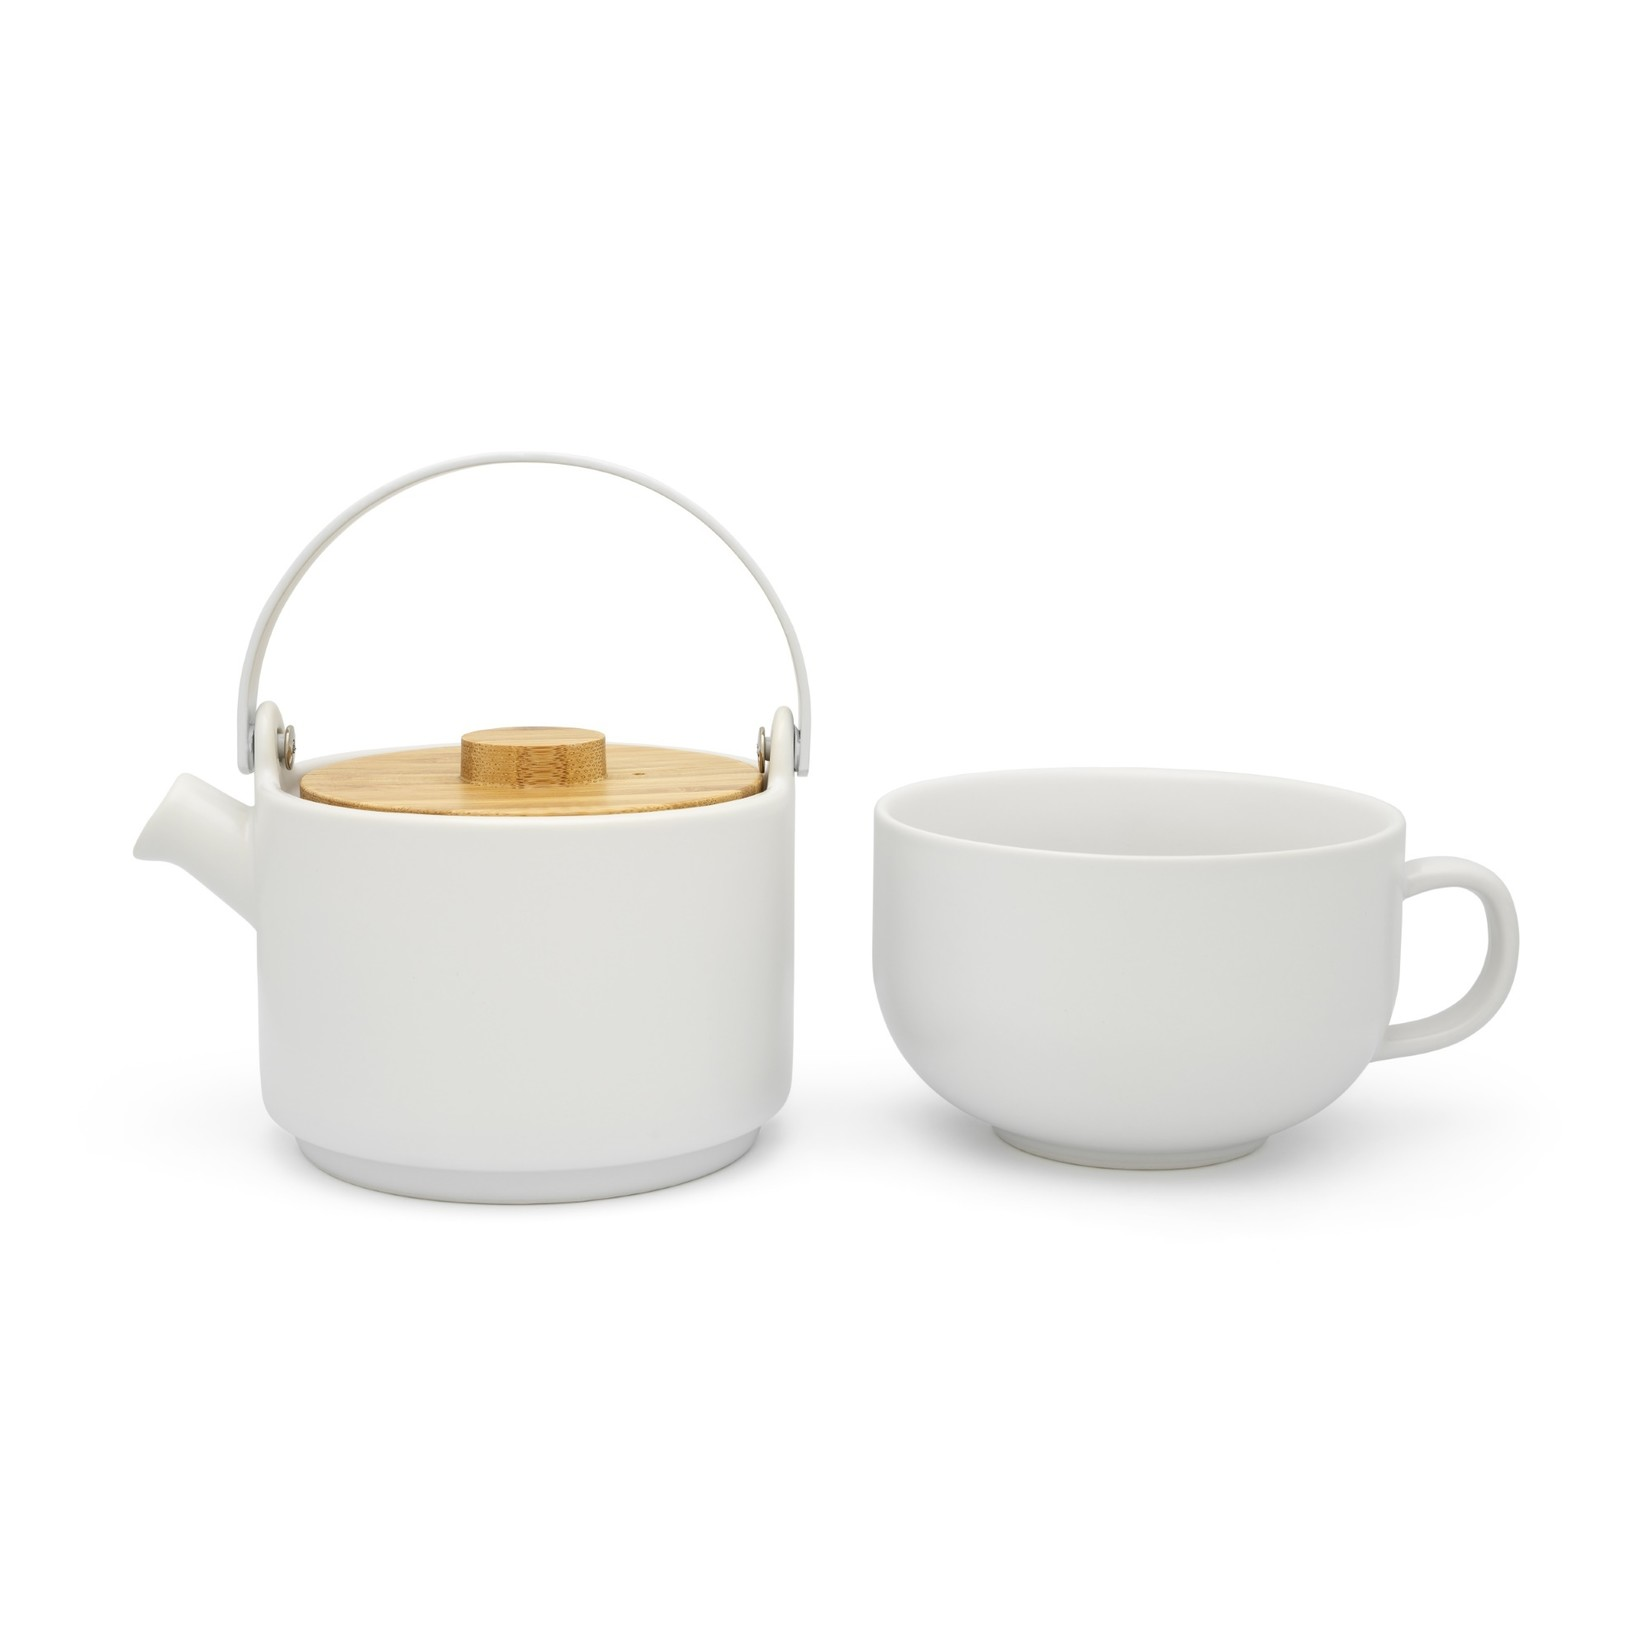 Bredemeijer Bredemeijer Silhouet theepotten Tea for one Umea wit met bamboedeksel 500ml